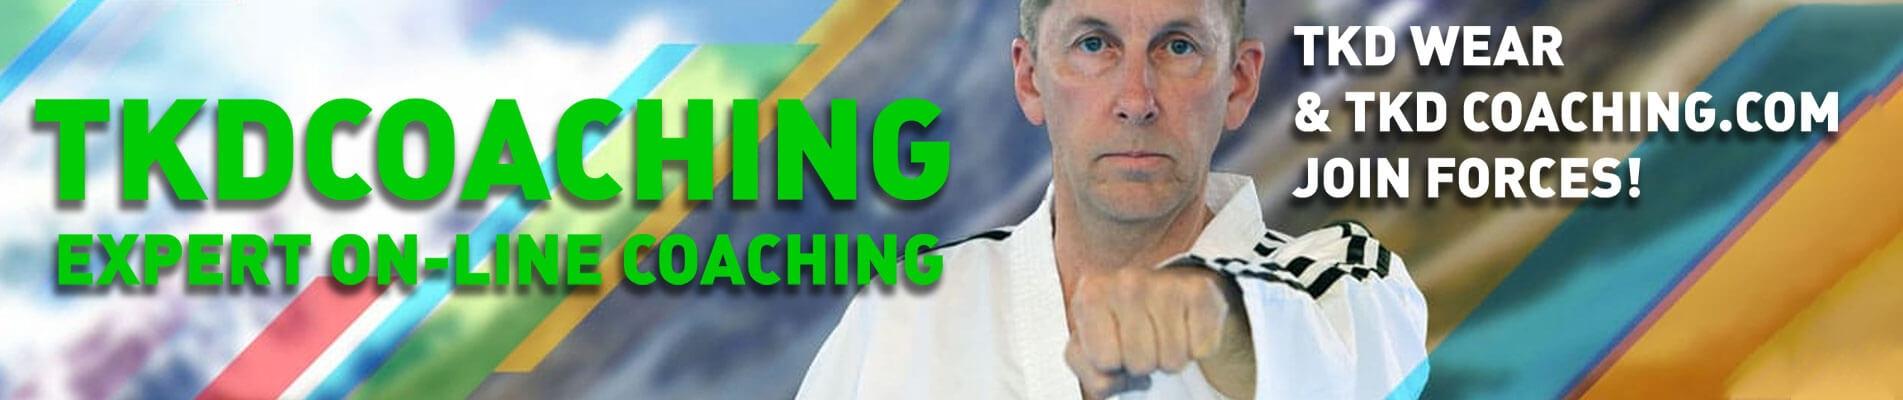 TKD Coaching